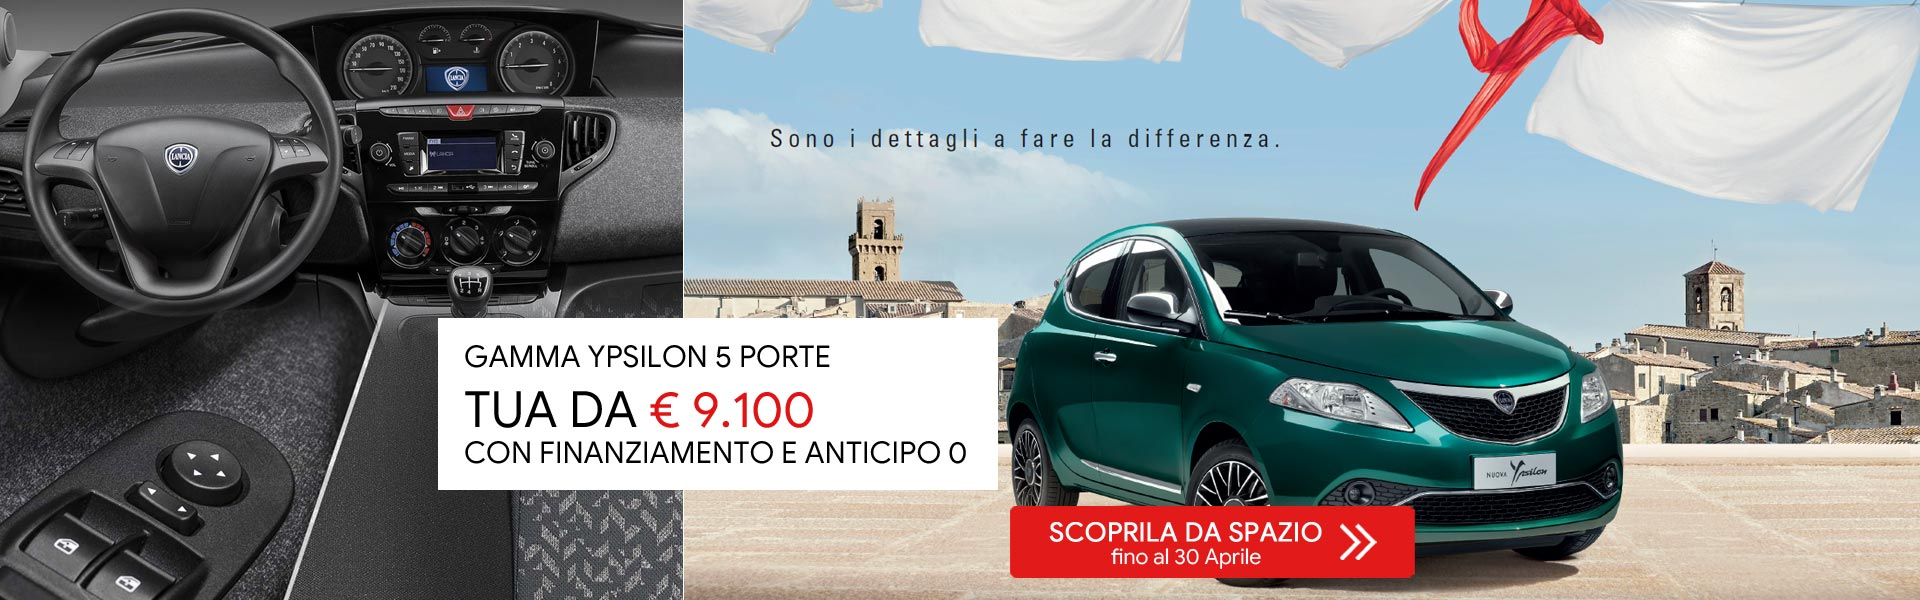 Lancia Ypsilon 5 porte